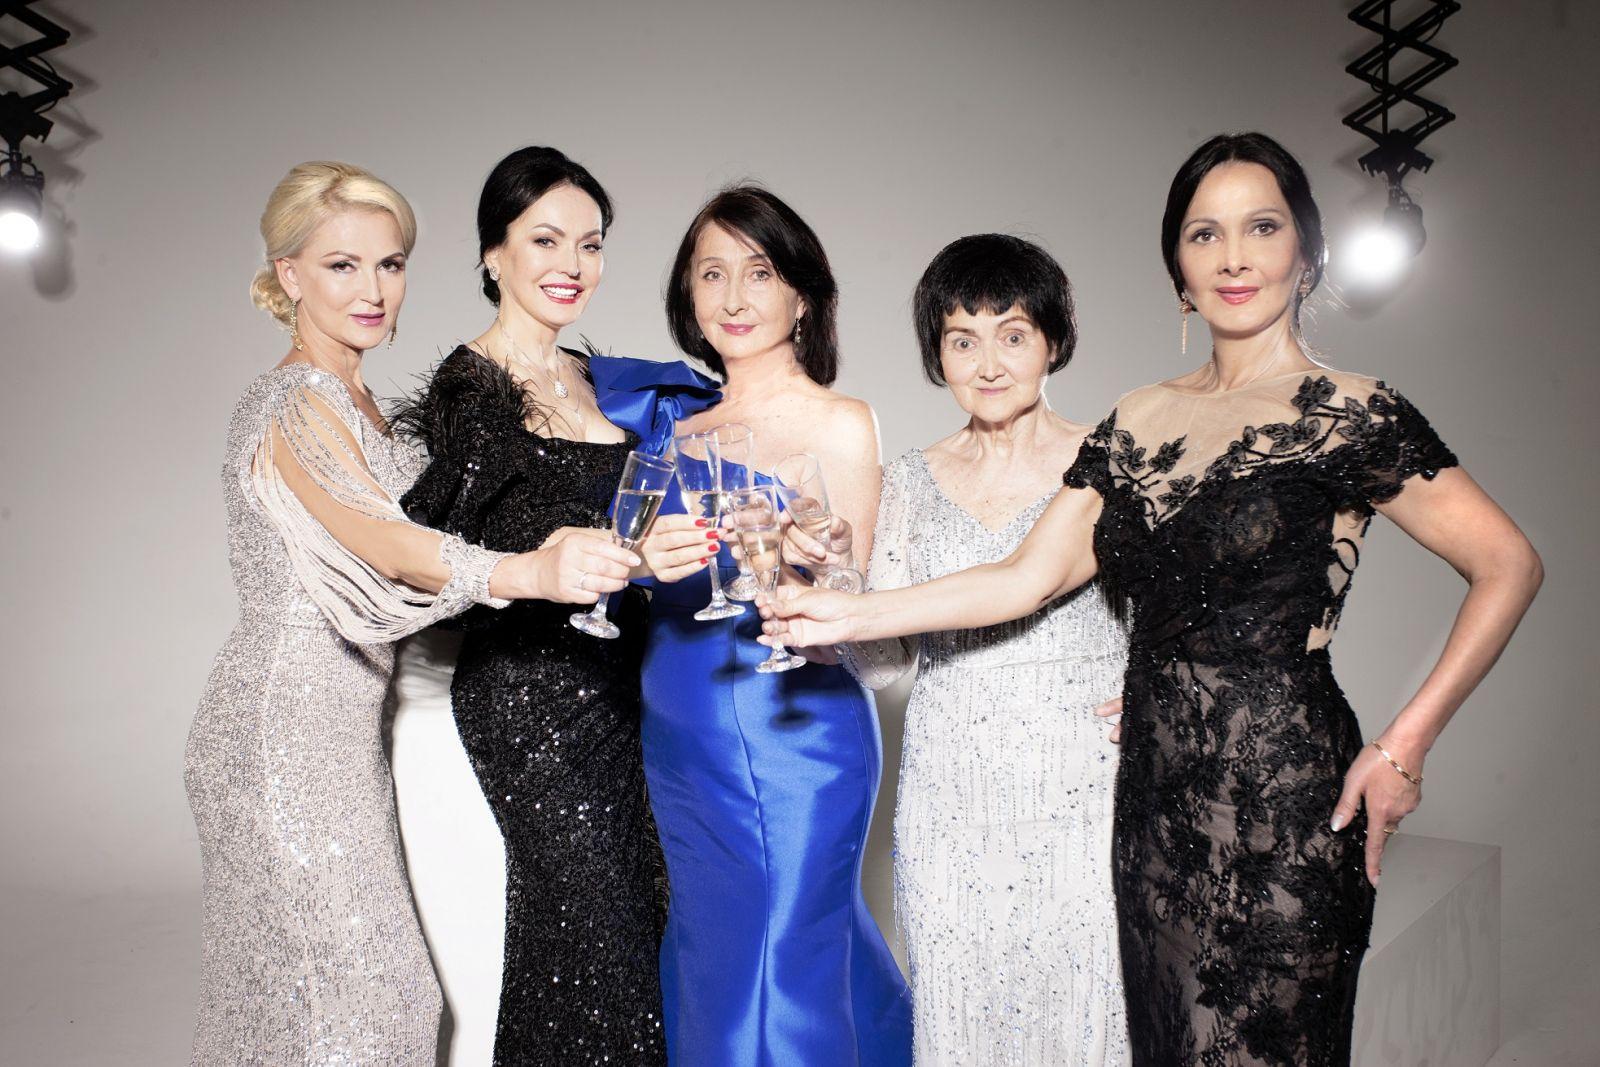 советские модели, фото, в наше время, Оксана Сирота, Татьяна Савченко, Нонна Хасанова, Жанна Гончаренко, Ирина Чижова-Холлидей